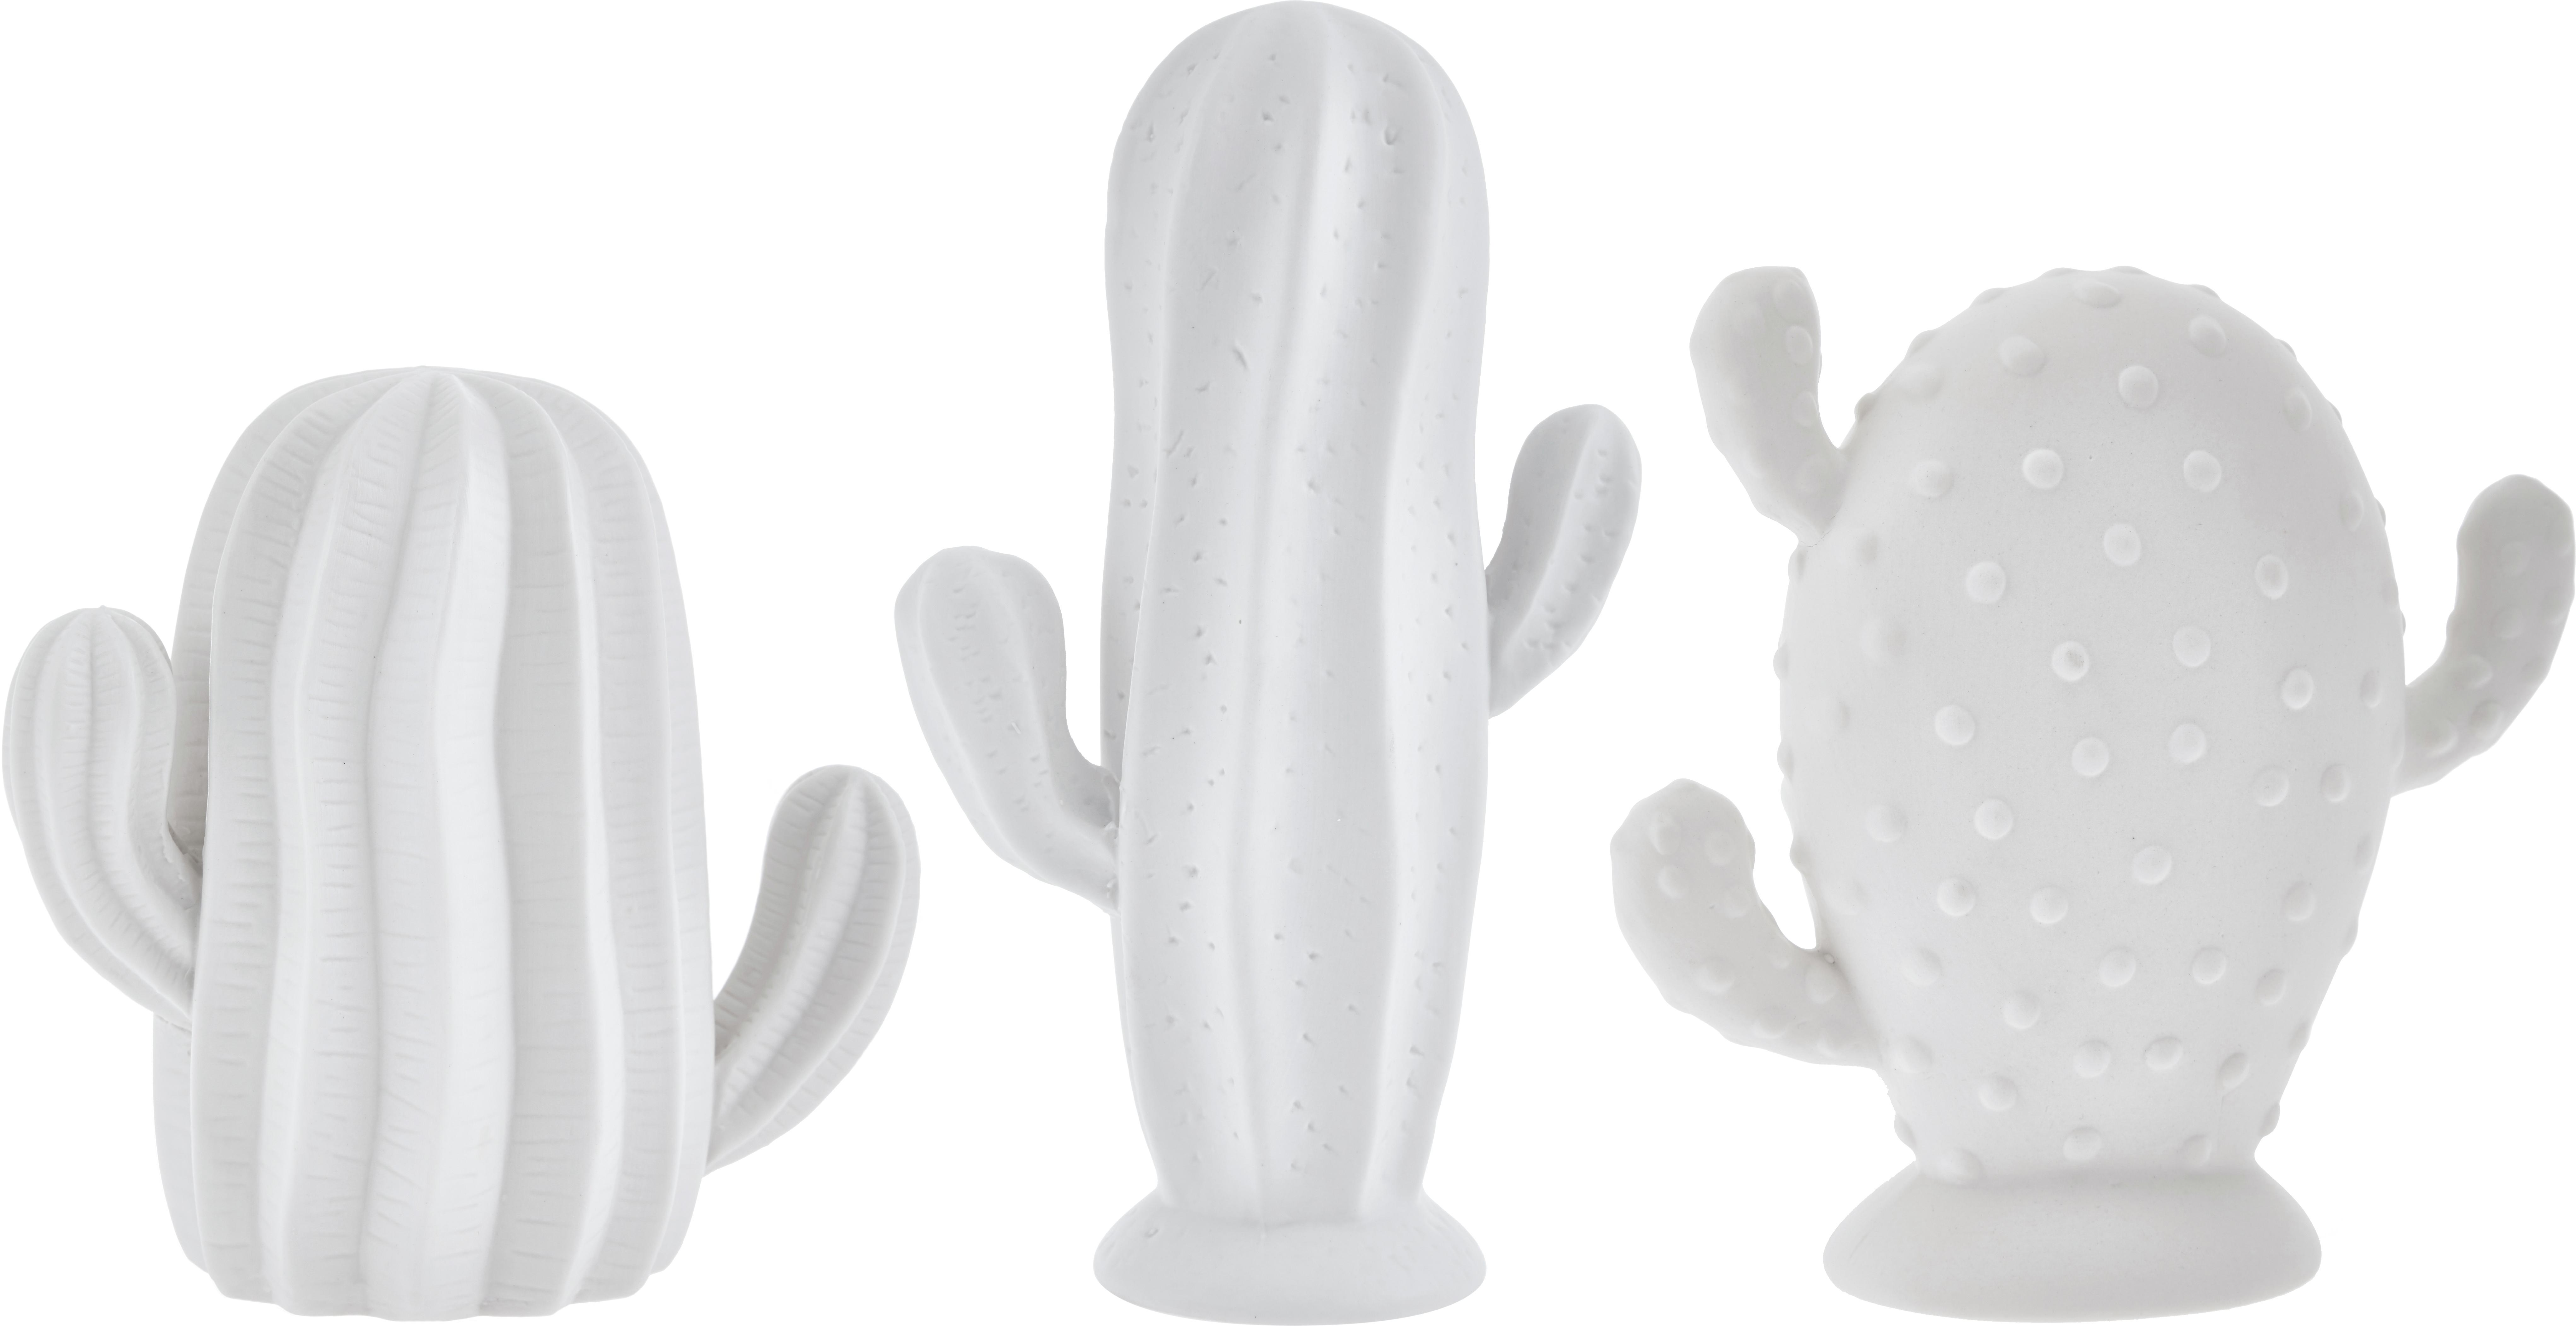 Set de cactus decorativos Dina, 3pzas., Porcelana, sin tratar, mate, Blanco, Set de diferentes tamaños